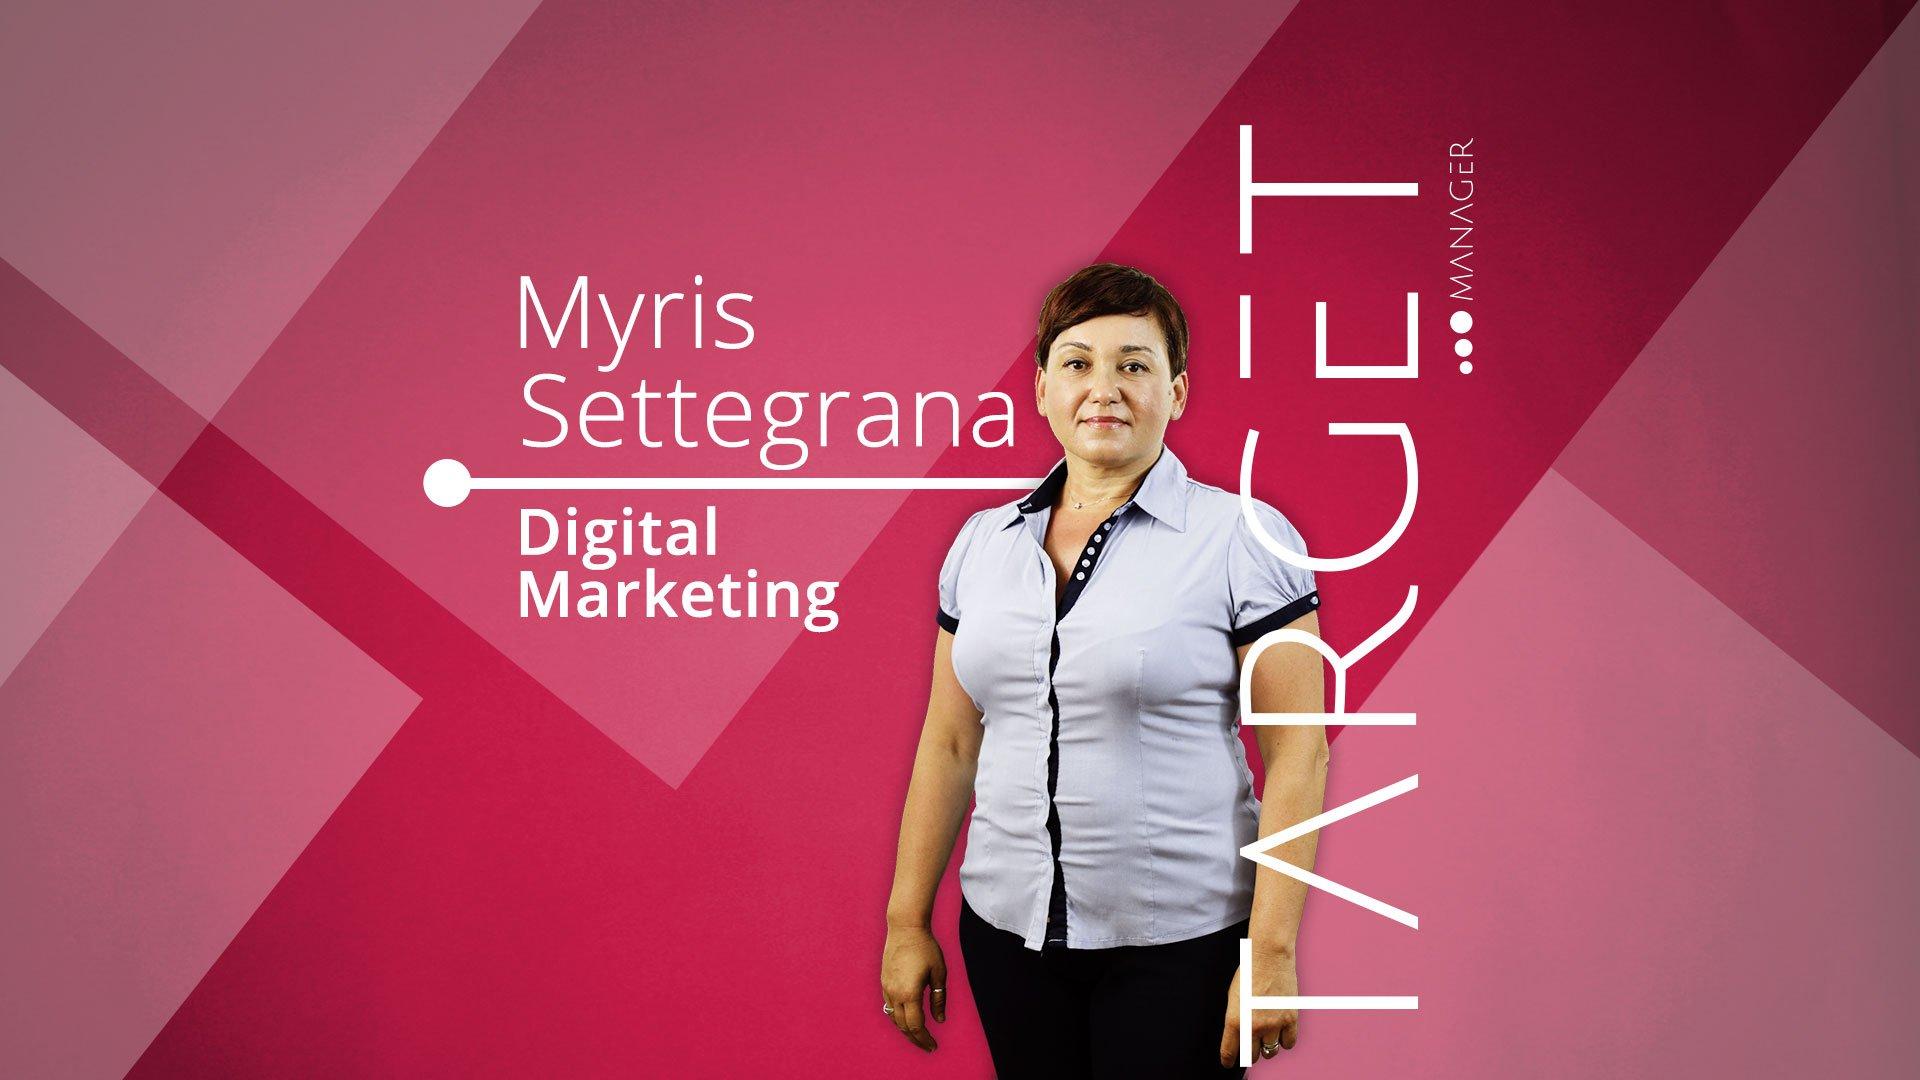 target-myris-settegrana